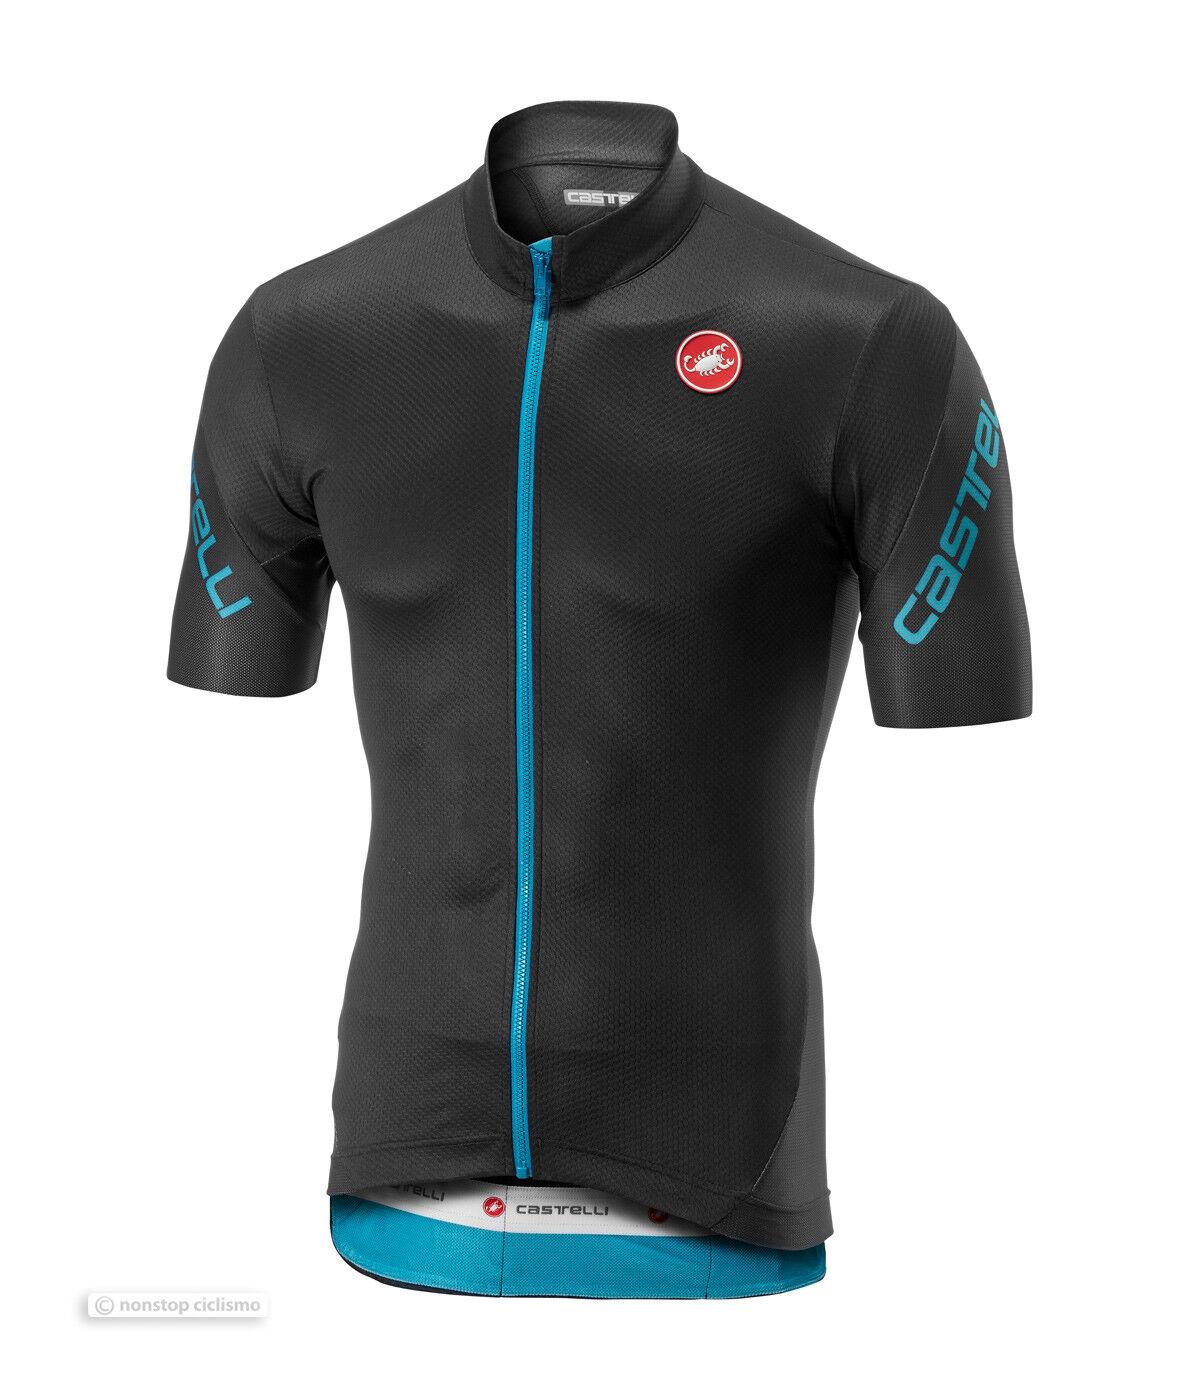 NEW Castelli ENTRATA 3 Short Sleeve  Full Zip Cycling Jersey   DARK GREY SKY blueE  inexpensive